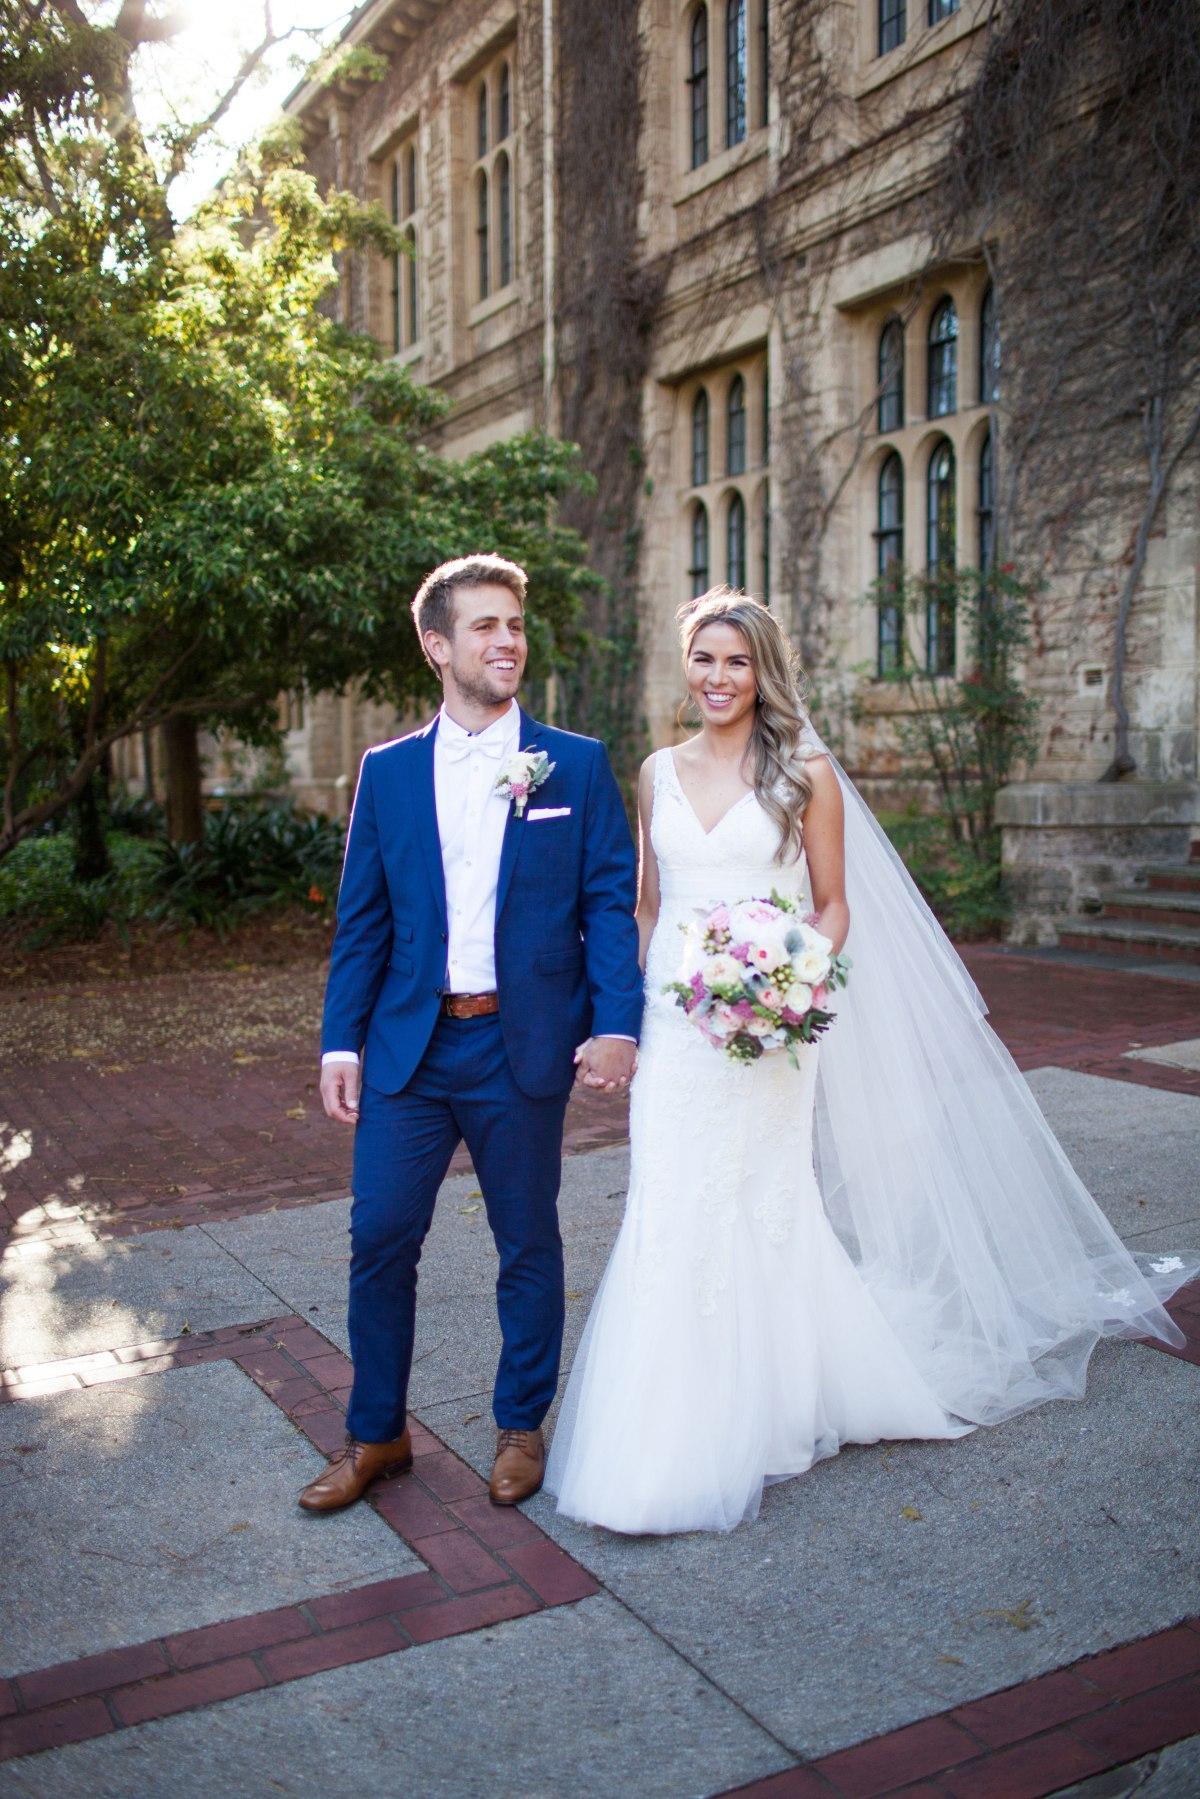 kelsey-and-malan-Wedding-4-Bridal-portraits-0064